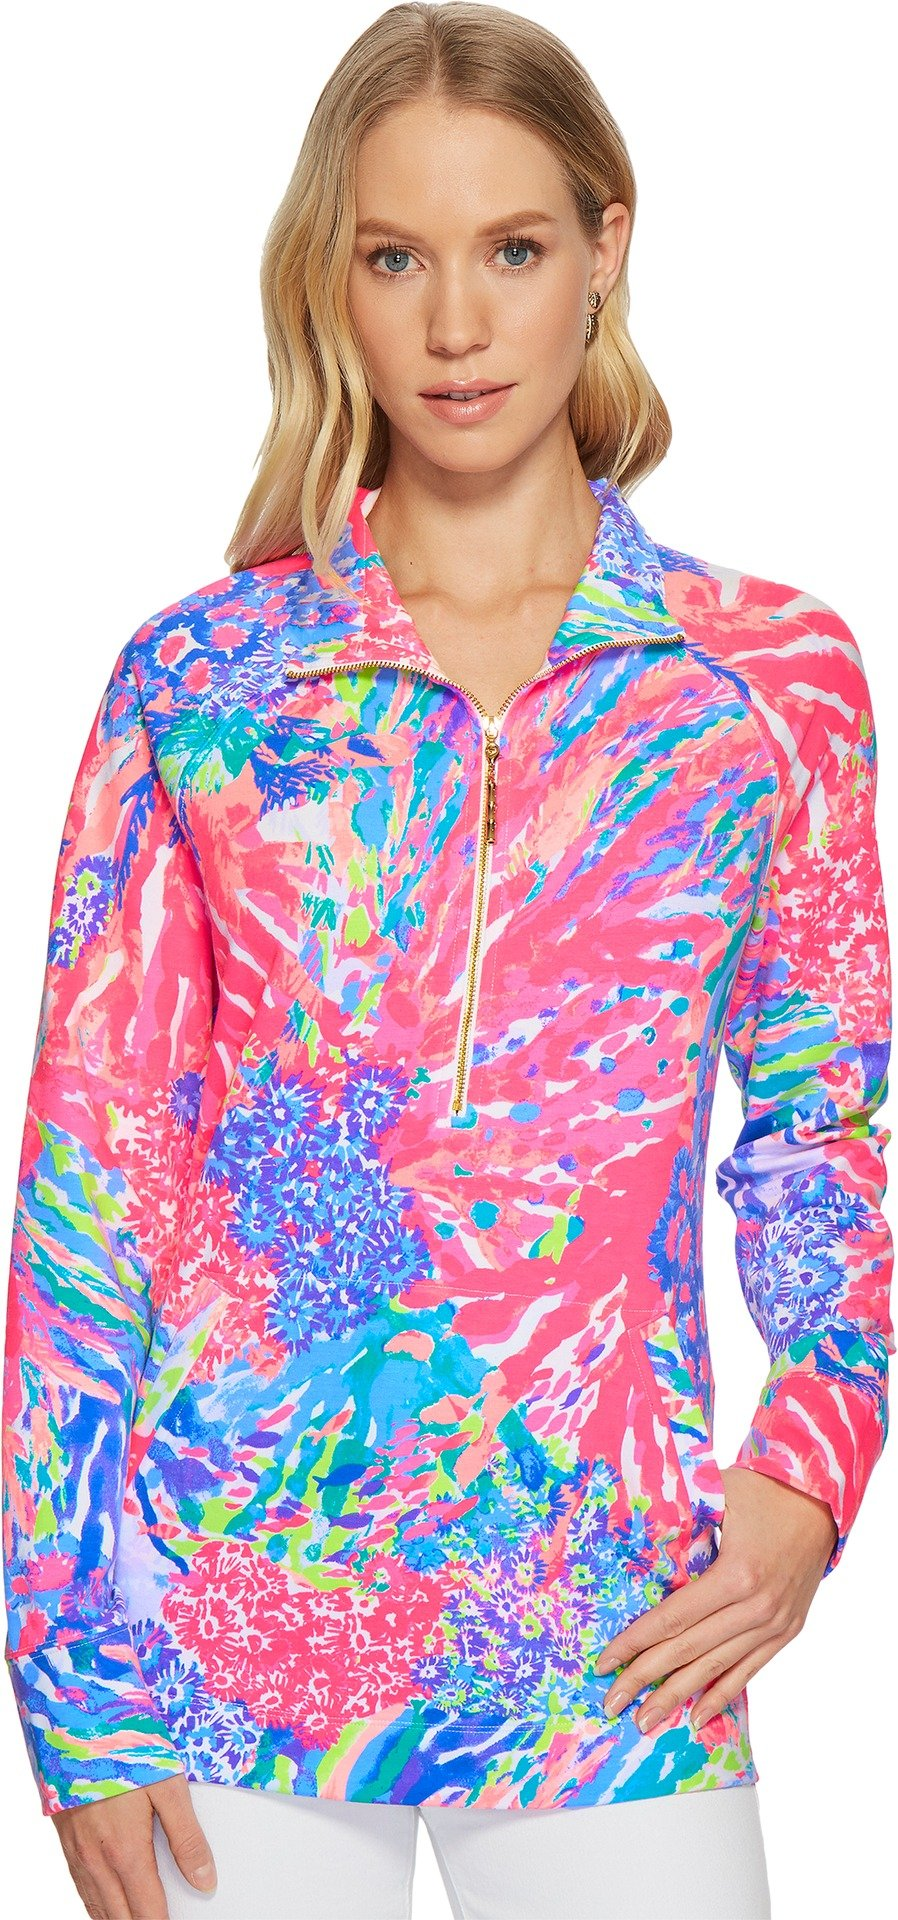 Lilly Pulitzer Women's UPF 50+ Skipper Printed Popover Multi Rainbow Soleil Medium